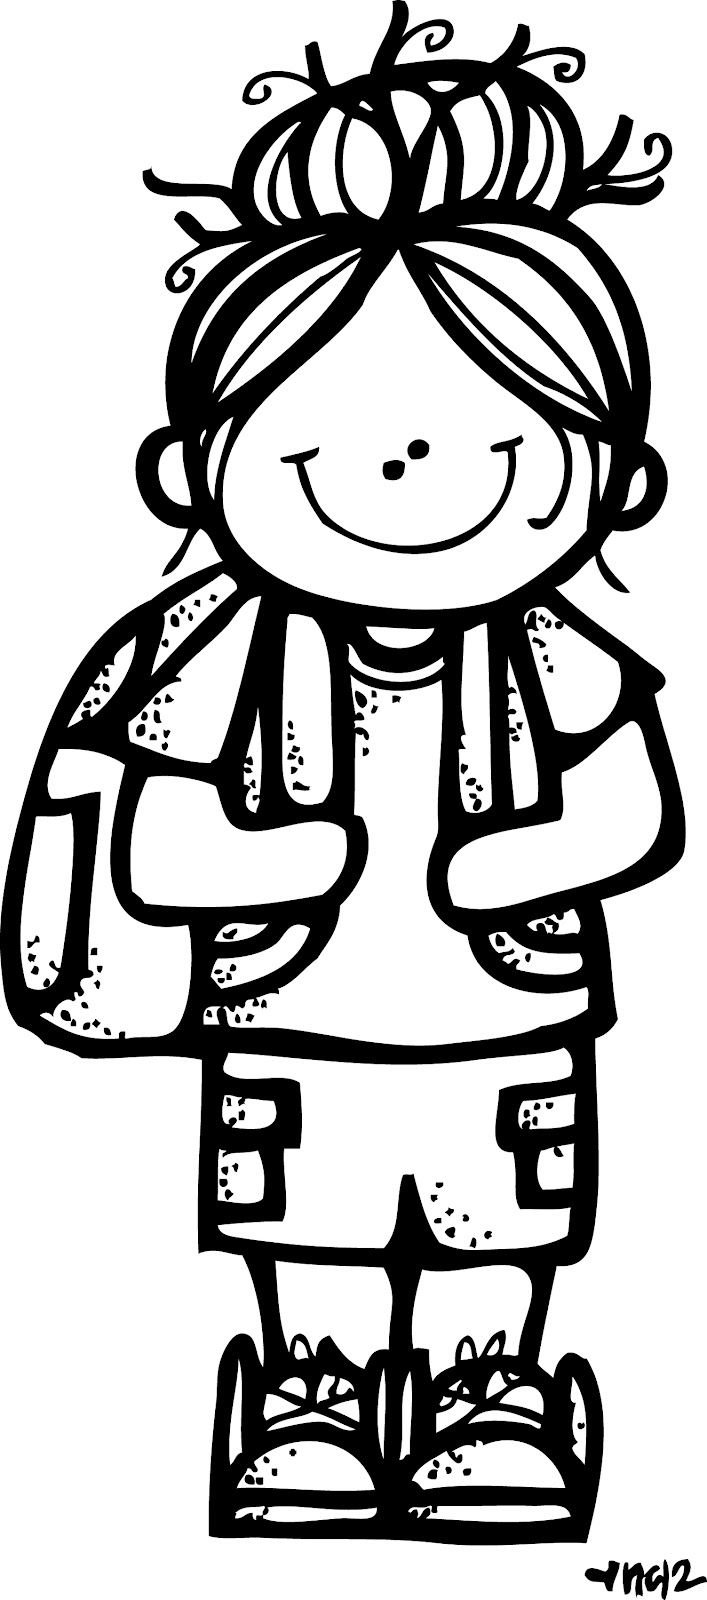 Illustration clipart melonheadz Camp LDS Illustrations illustrating: Melonheadz